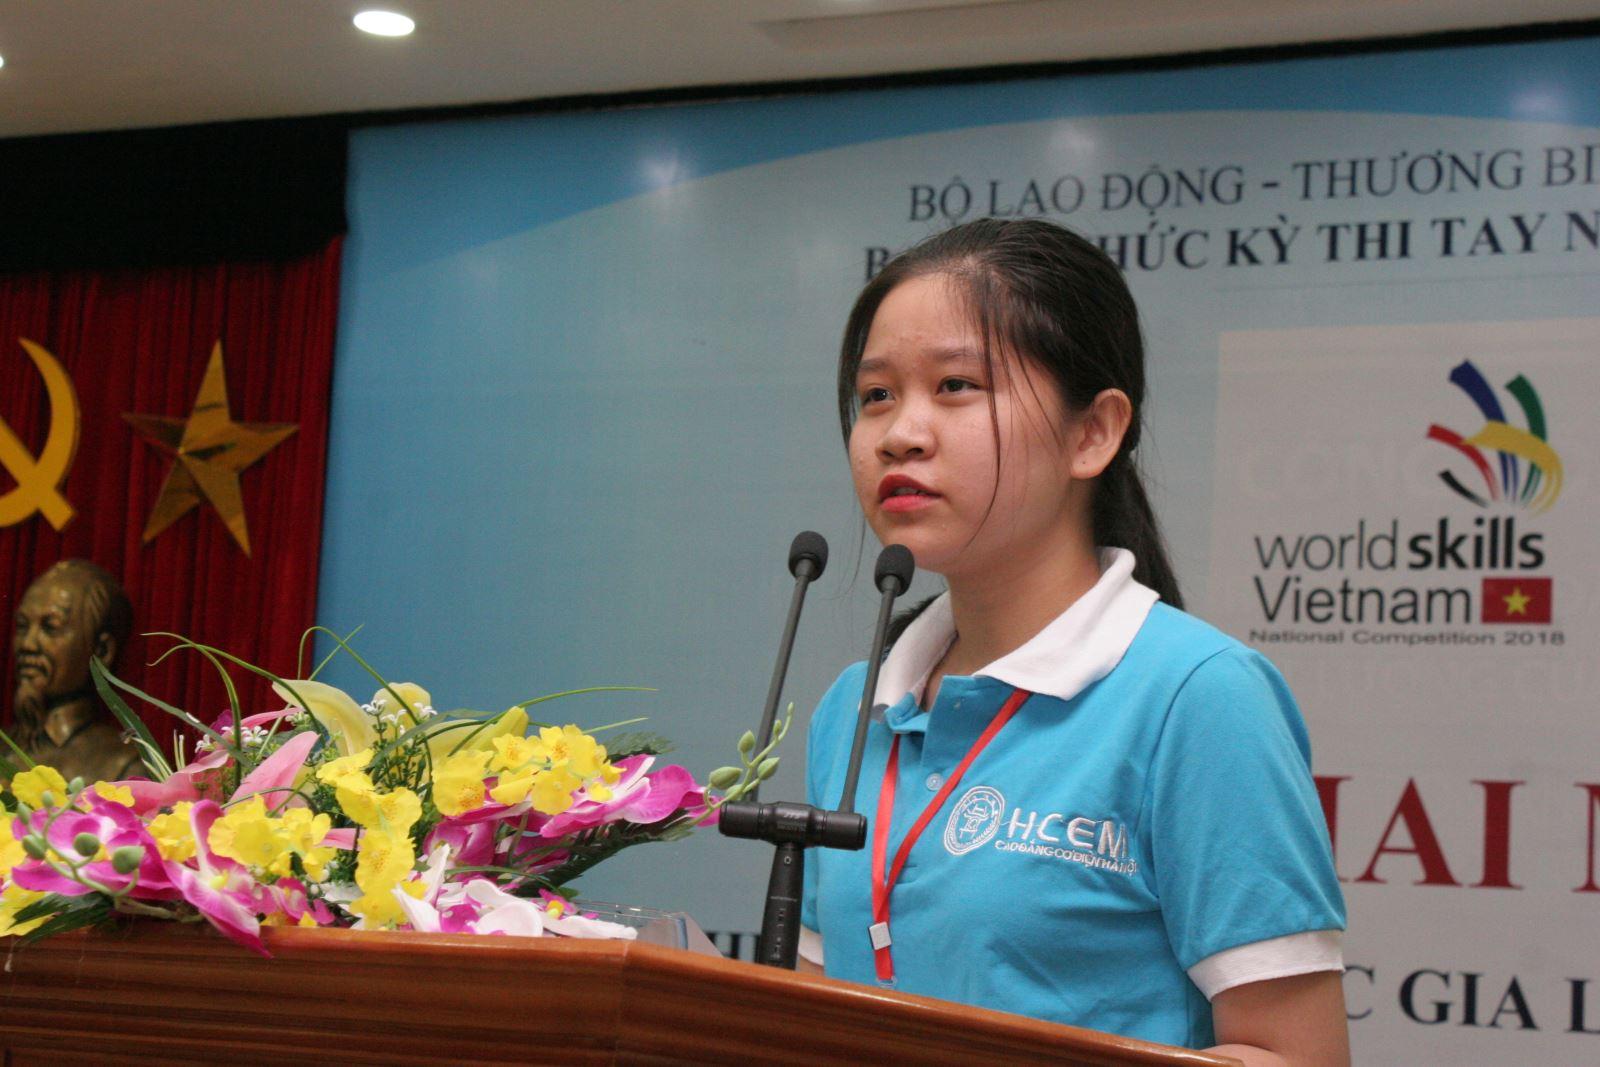 http://www.molisa.gov.vn/Images/editor/images/IMG_5600(1).JPG